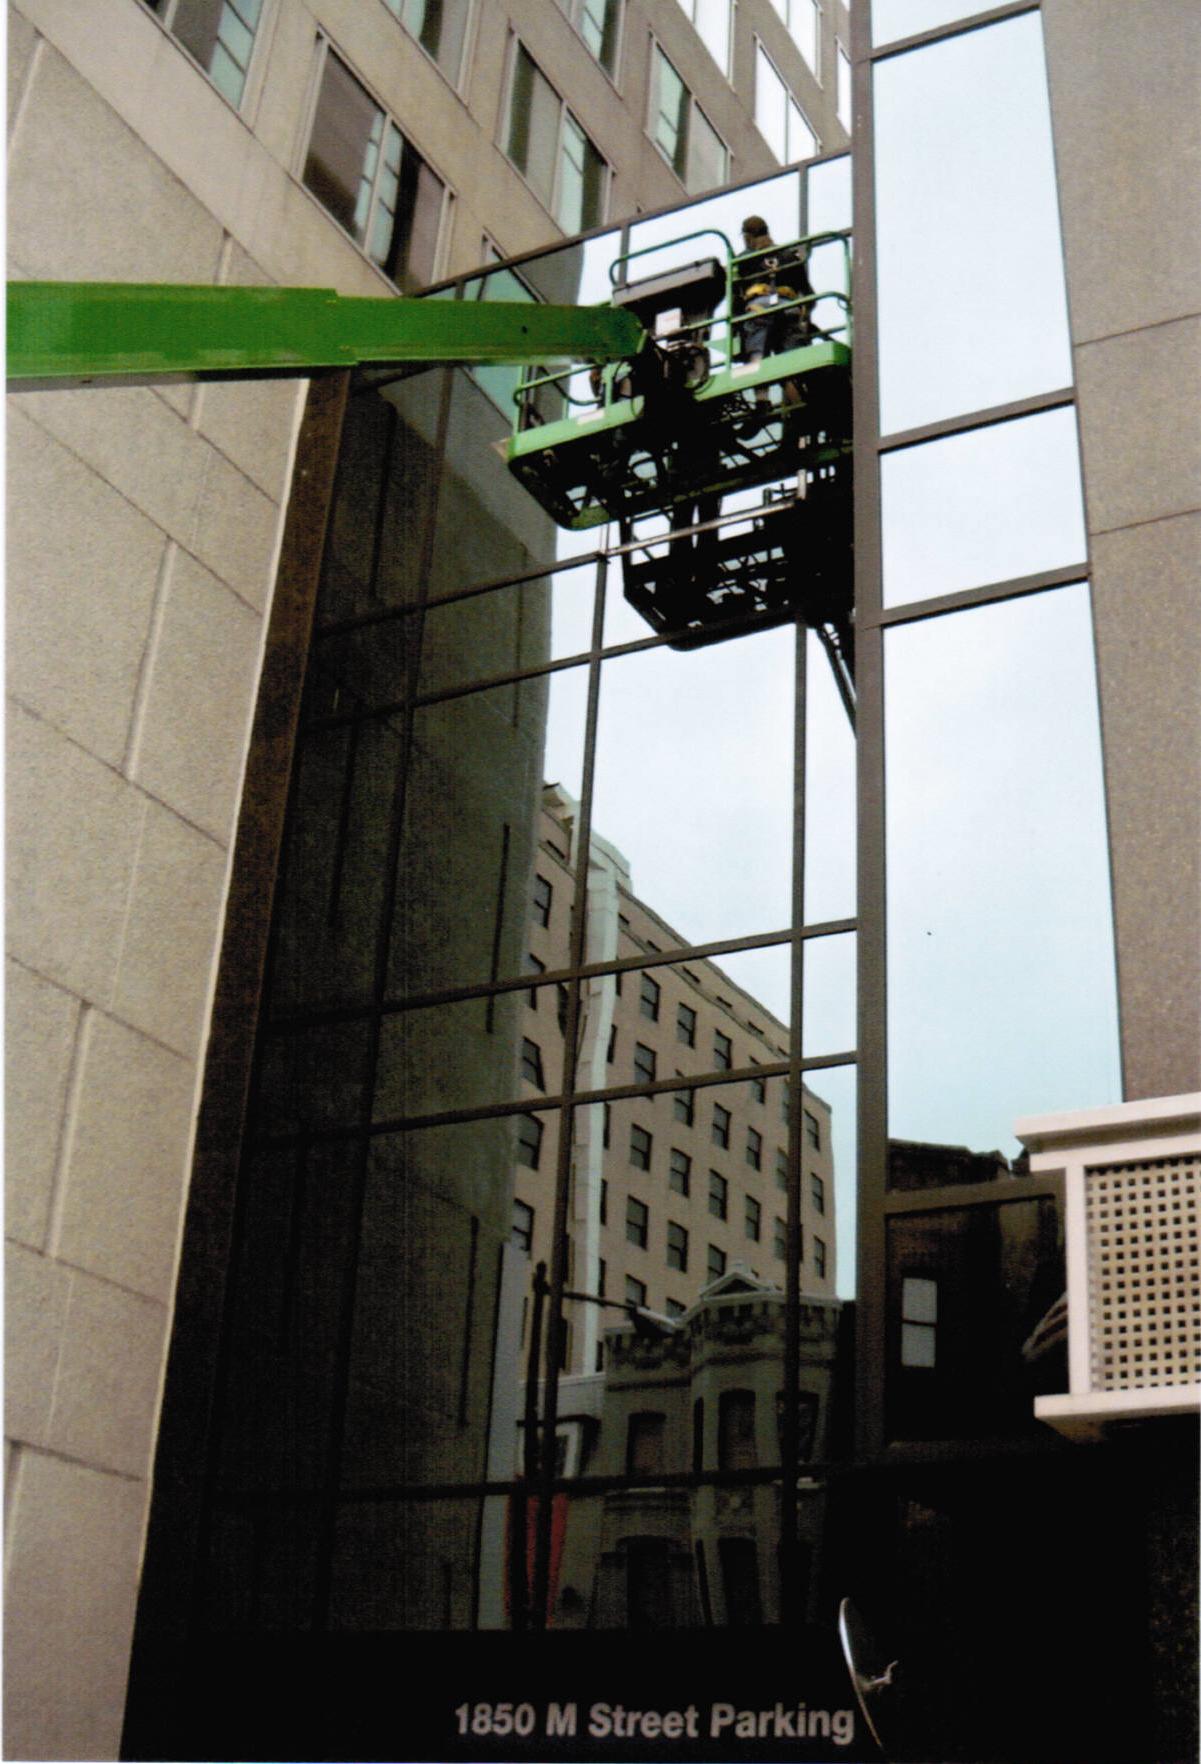 1850 M Street - Apple Valley Glass & Doors Company Inc.